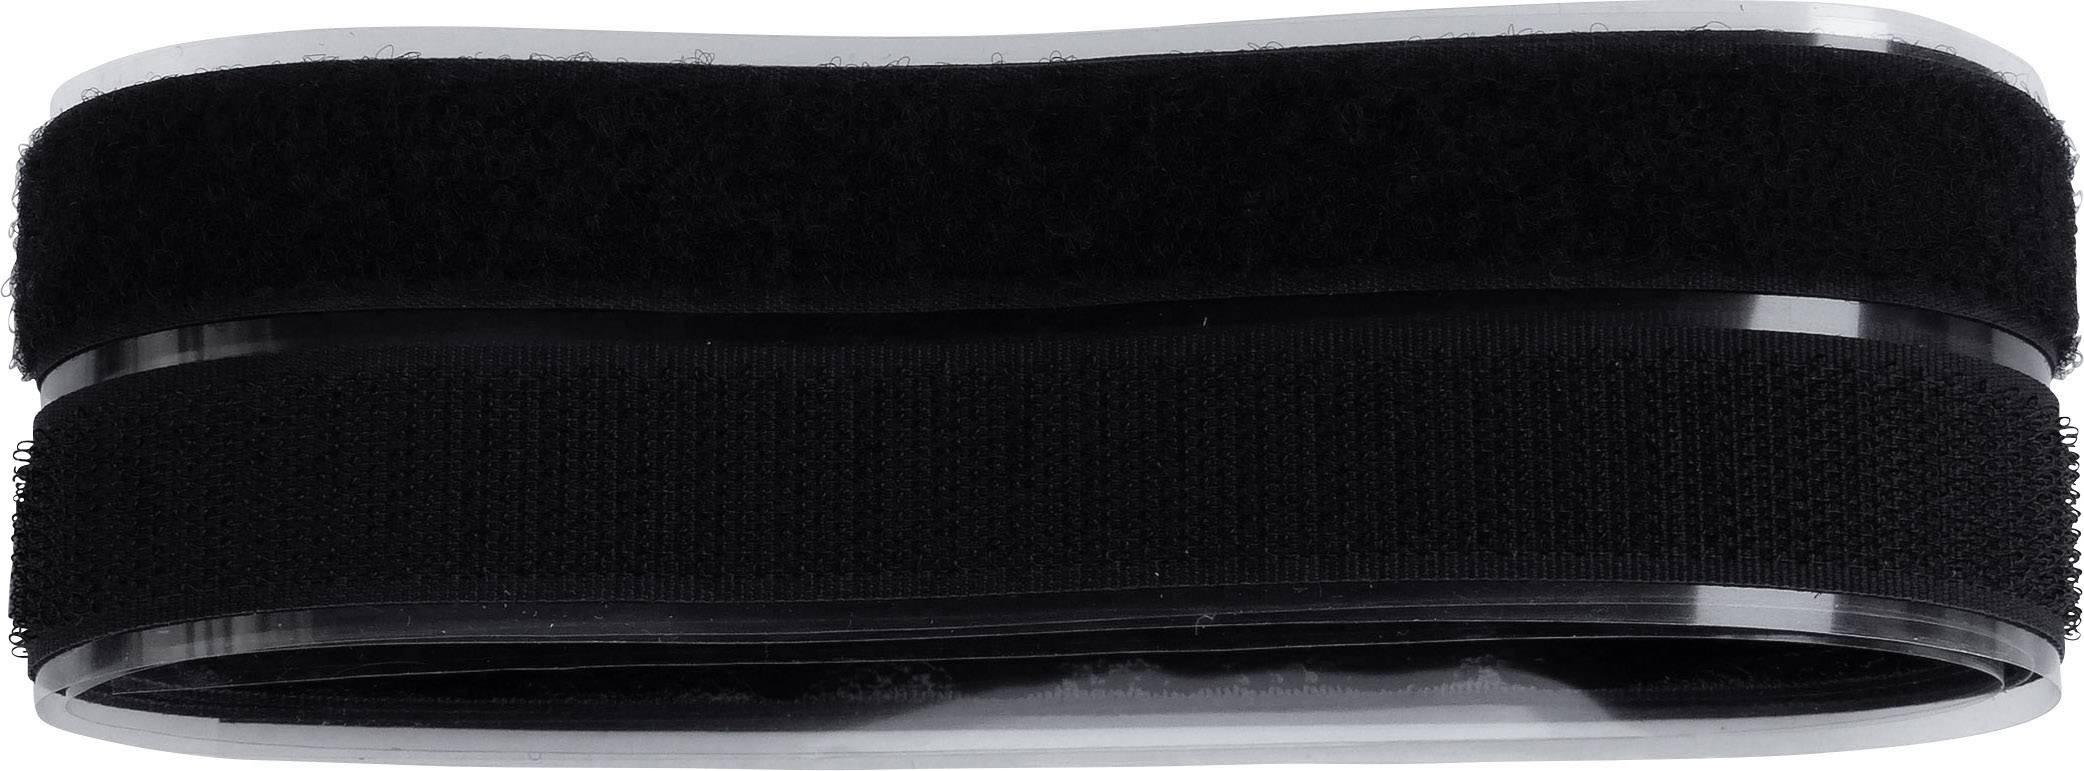 Lepiaci pásik so suchým zipsom TRU COMPONENTS 909-330-Bag, (d x š) 1000 mm x 20 mm, čierna, 1 pár